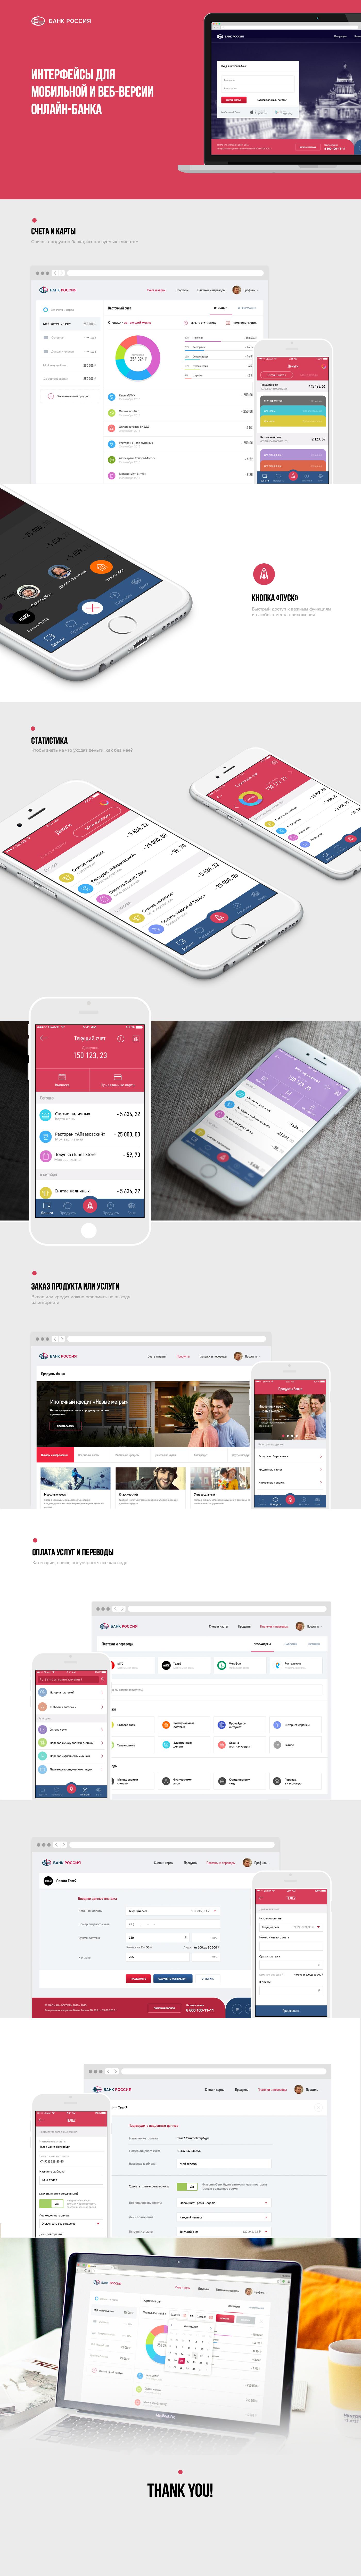 Web app mobile Bank finance ios online Interface UI ux flat